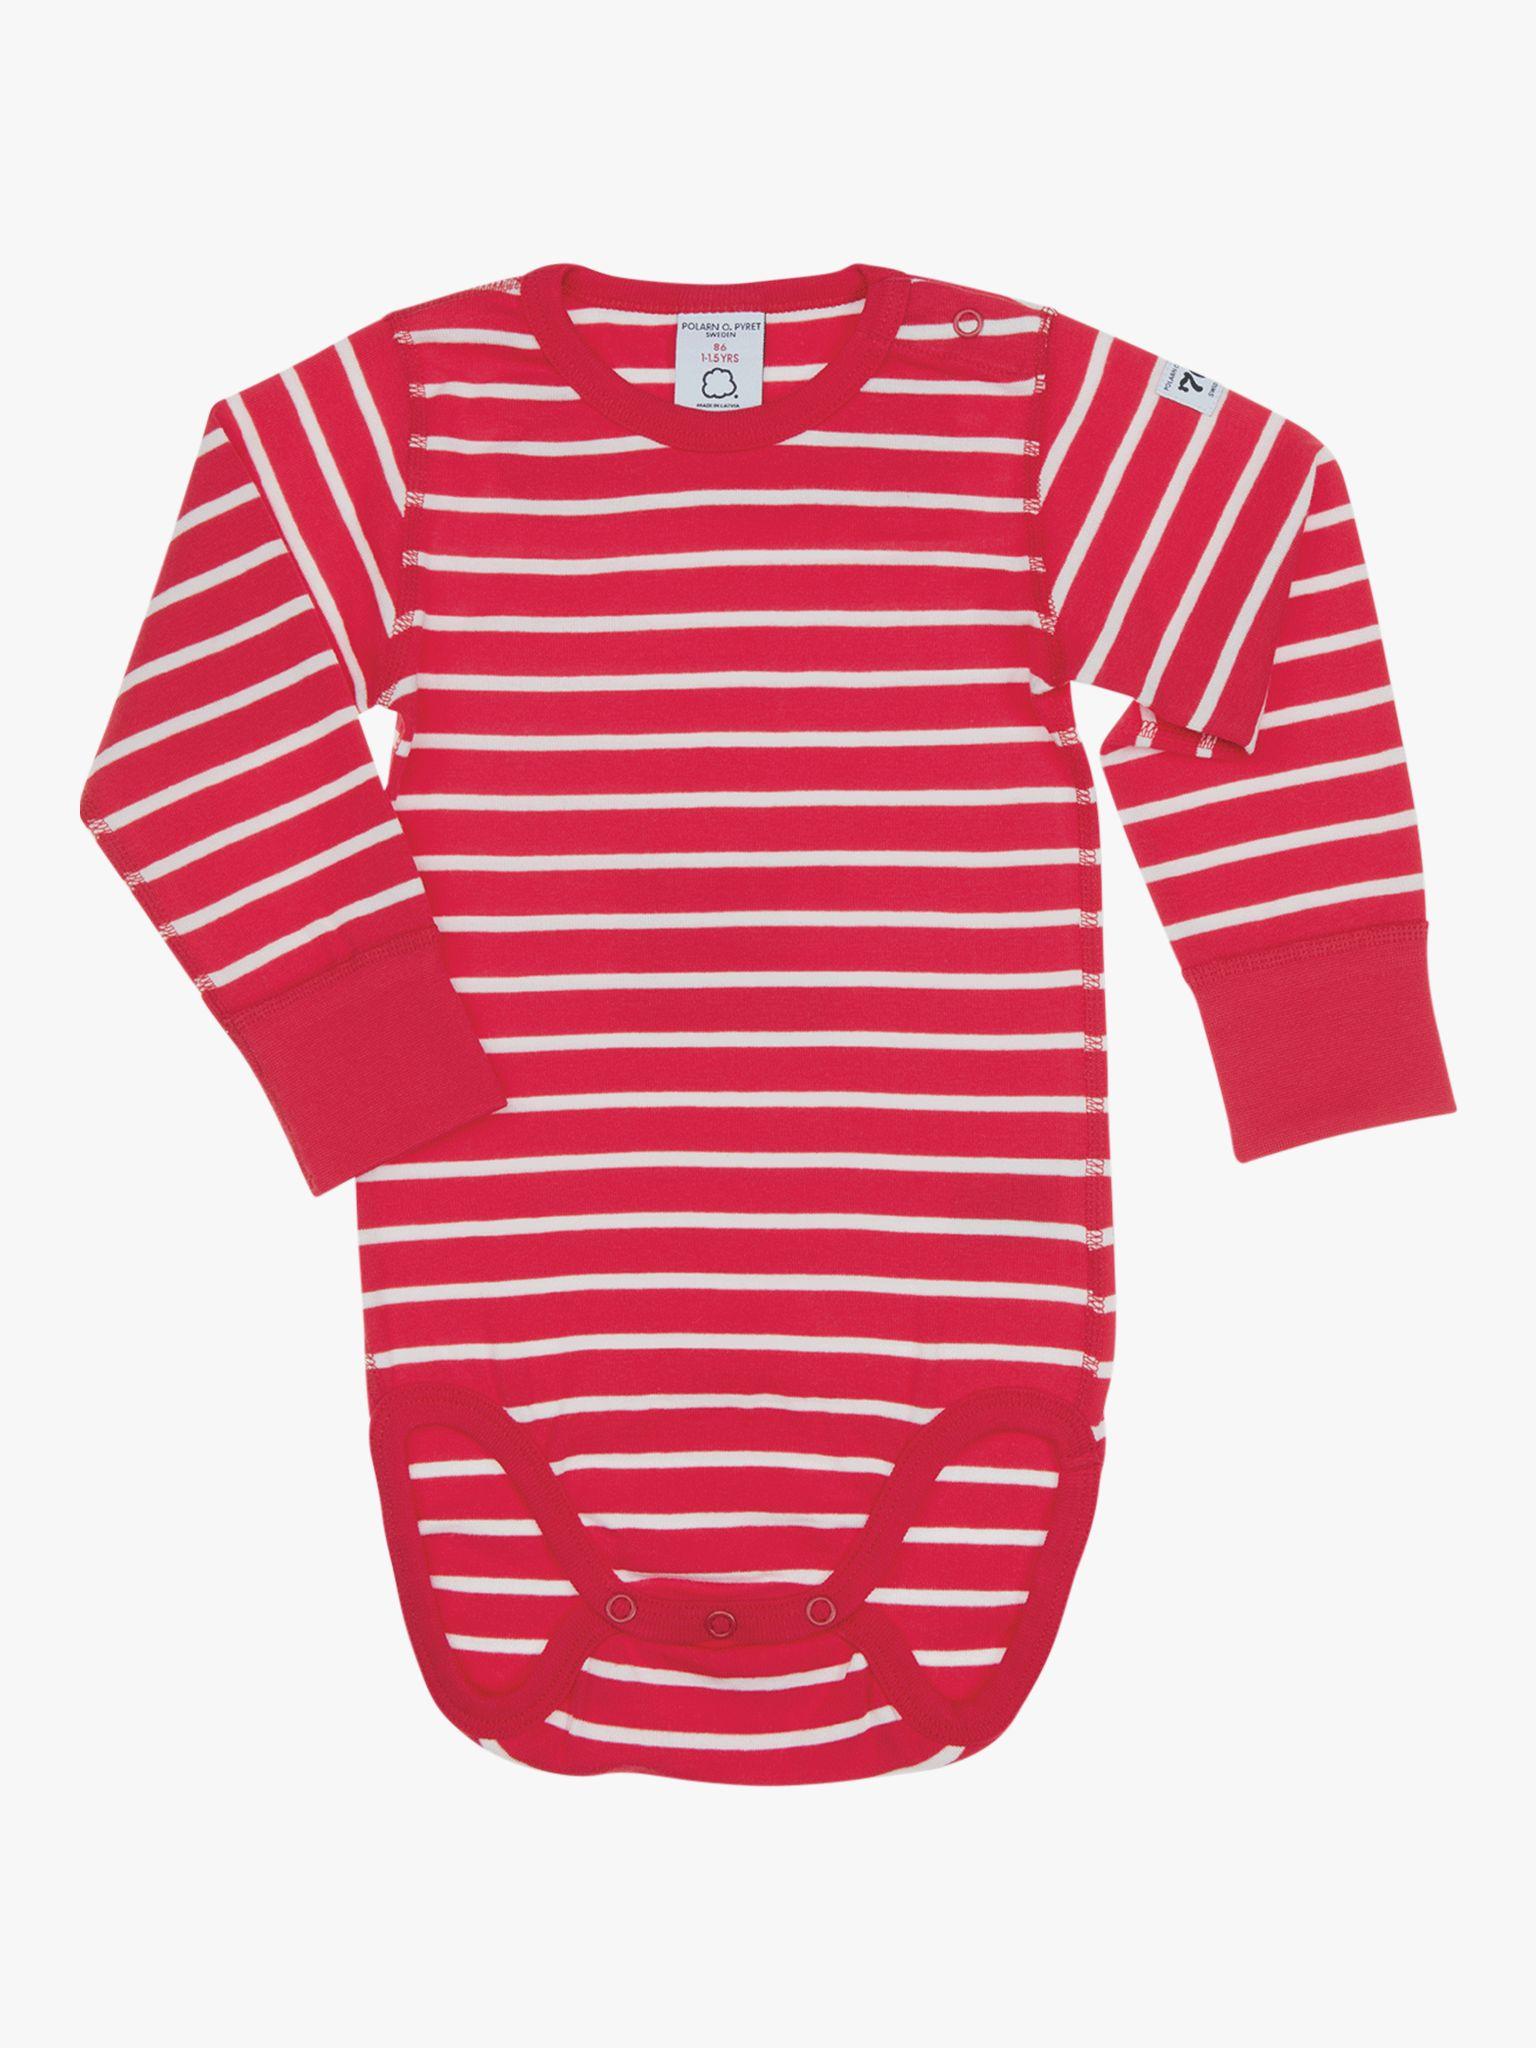 Polarn O. Pyret Polarn O. Pyret Baby GOTS Organic Cotton Stripe Long Sleeve Bodysuit, Red